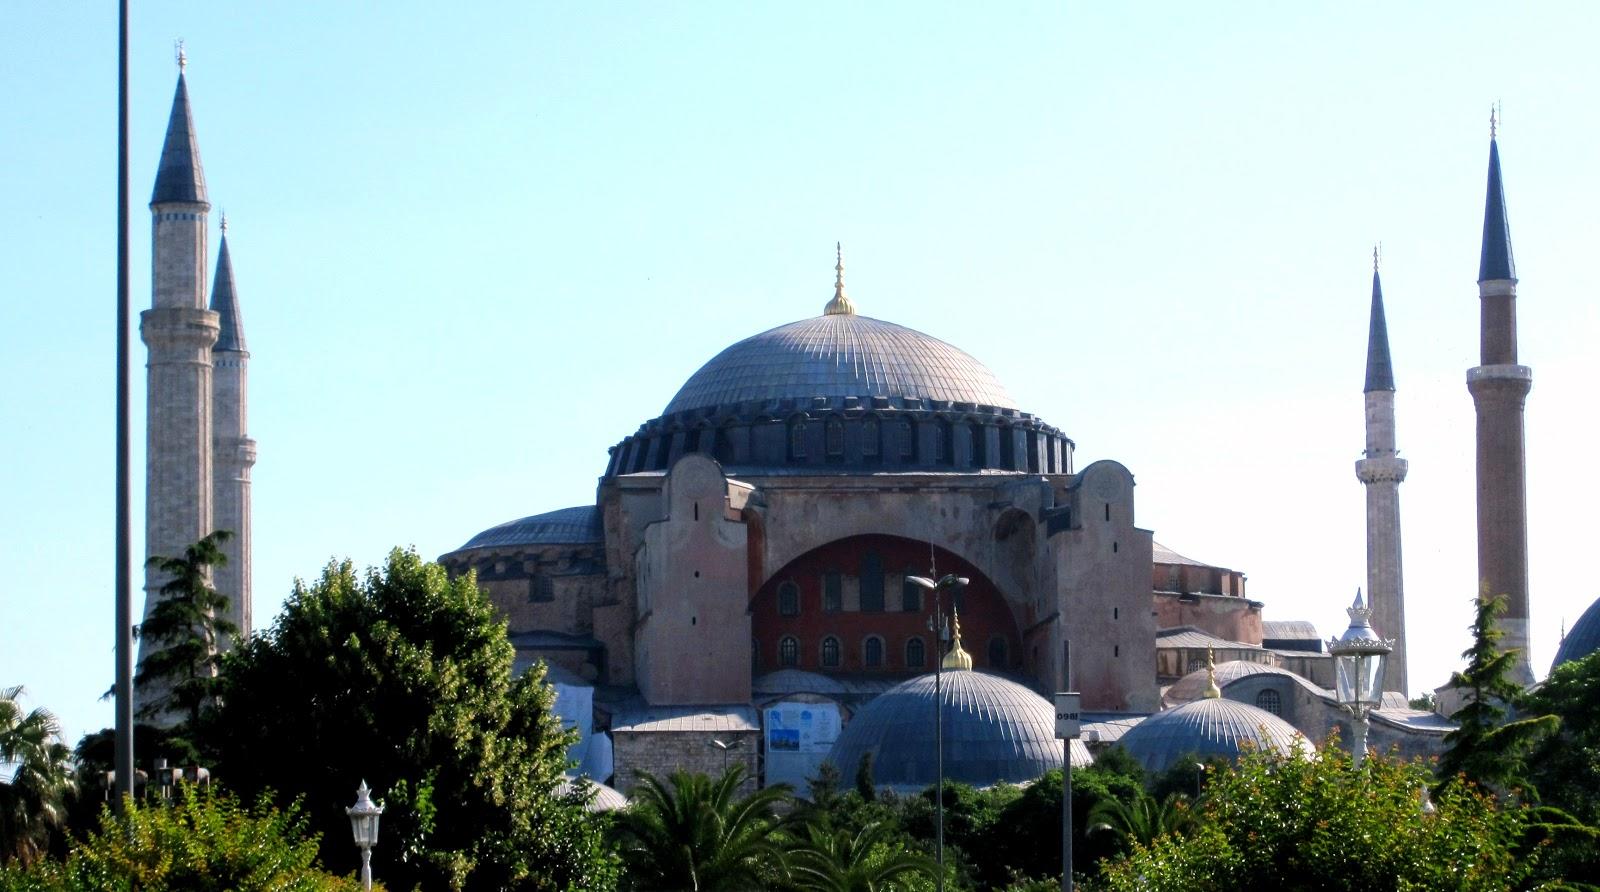 Cannundrums: Hagia Sophia - Istanbul